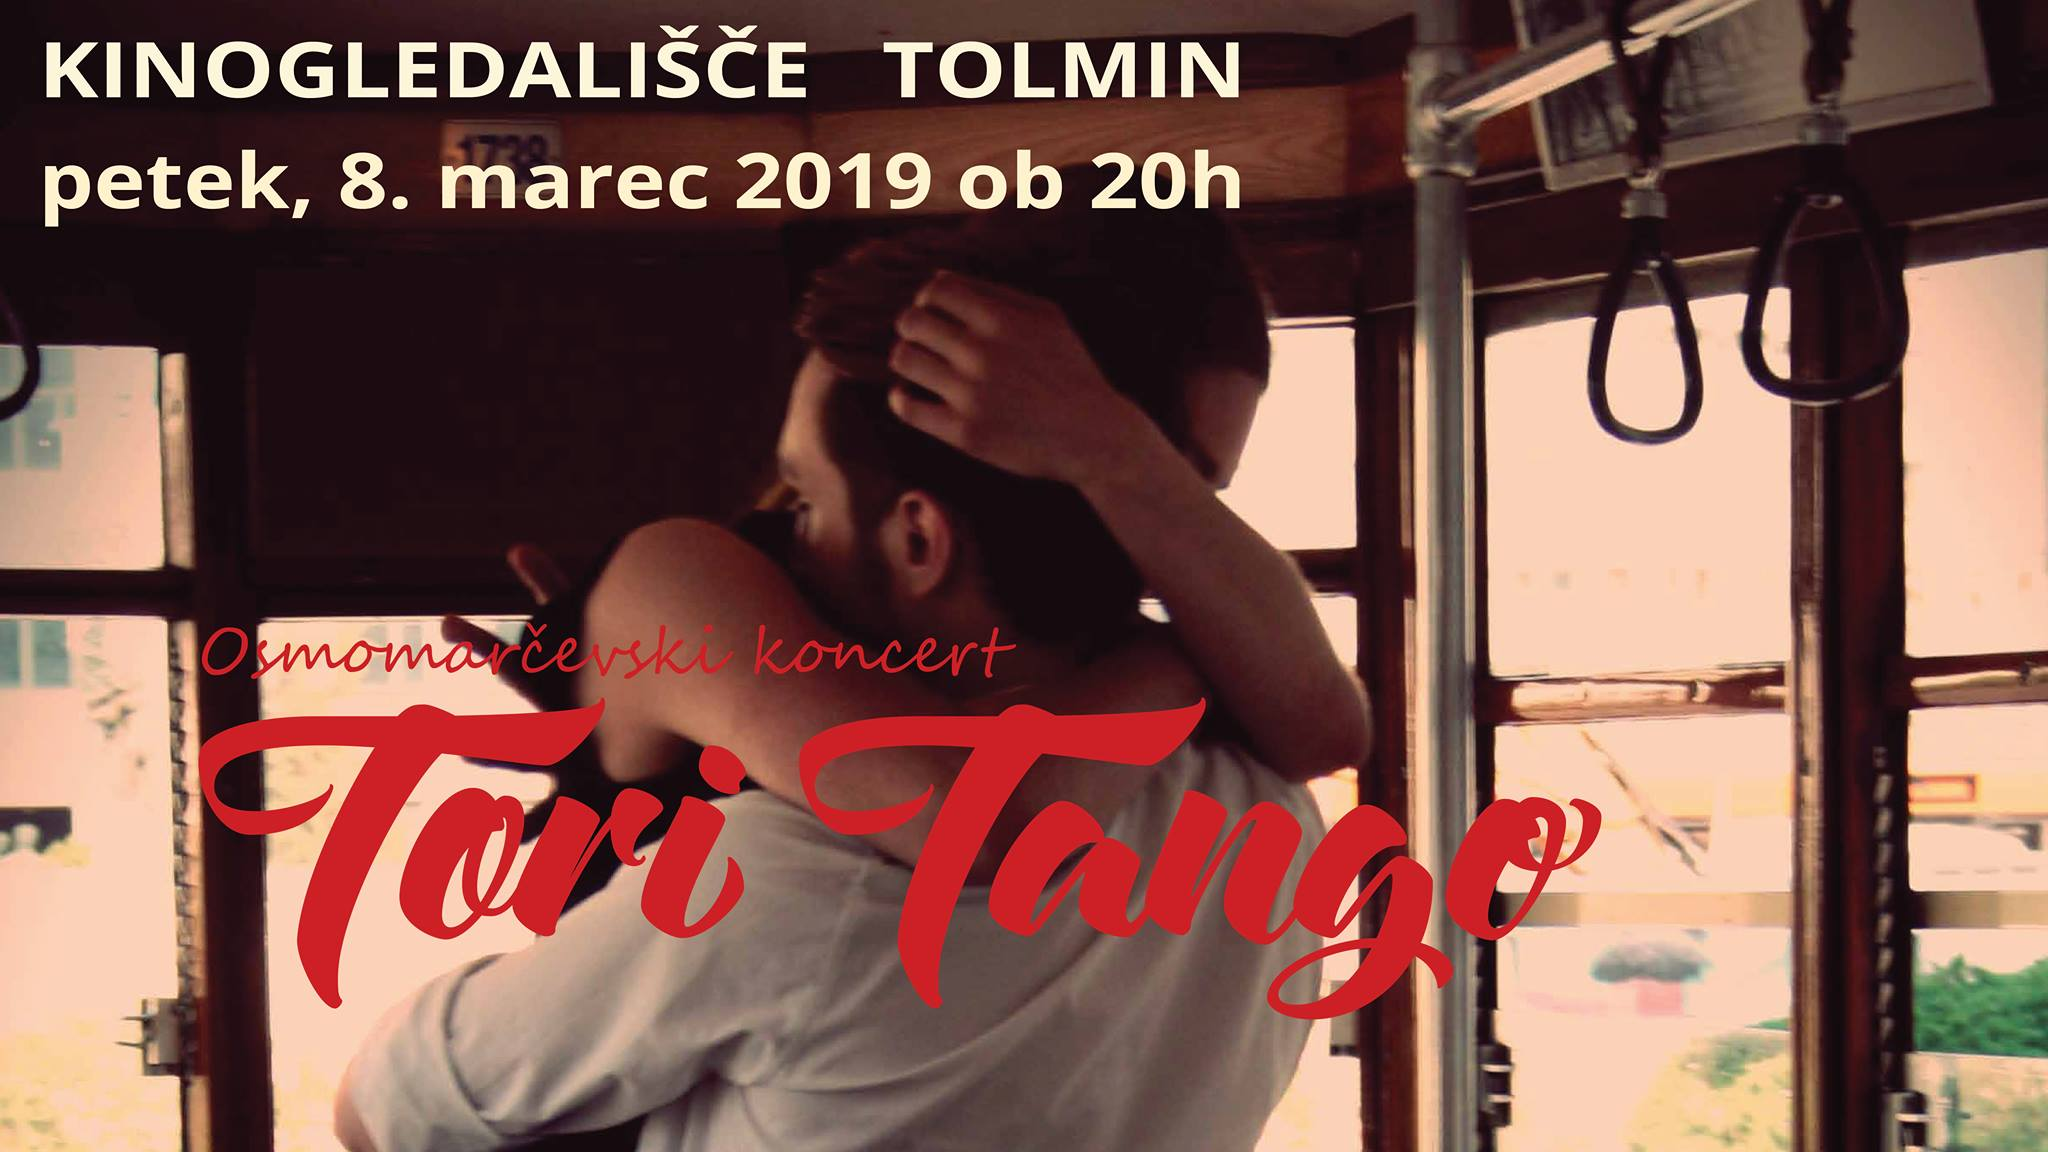 TORI TANGO (osmomarčevski koncert)